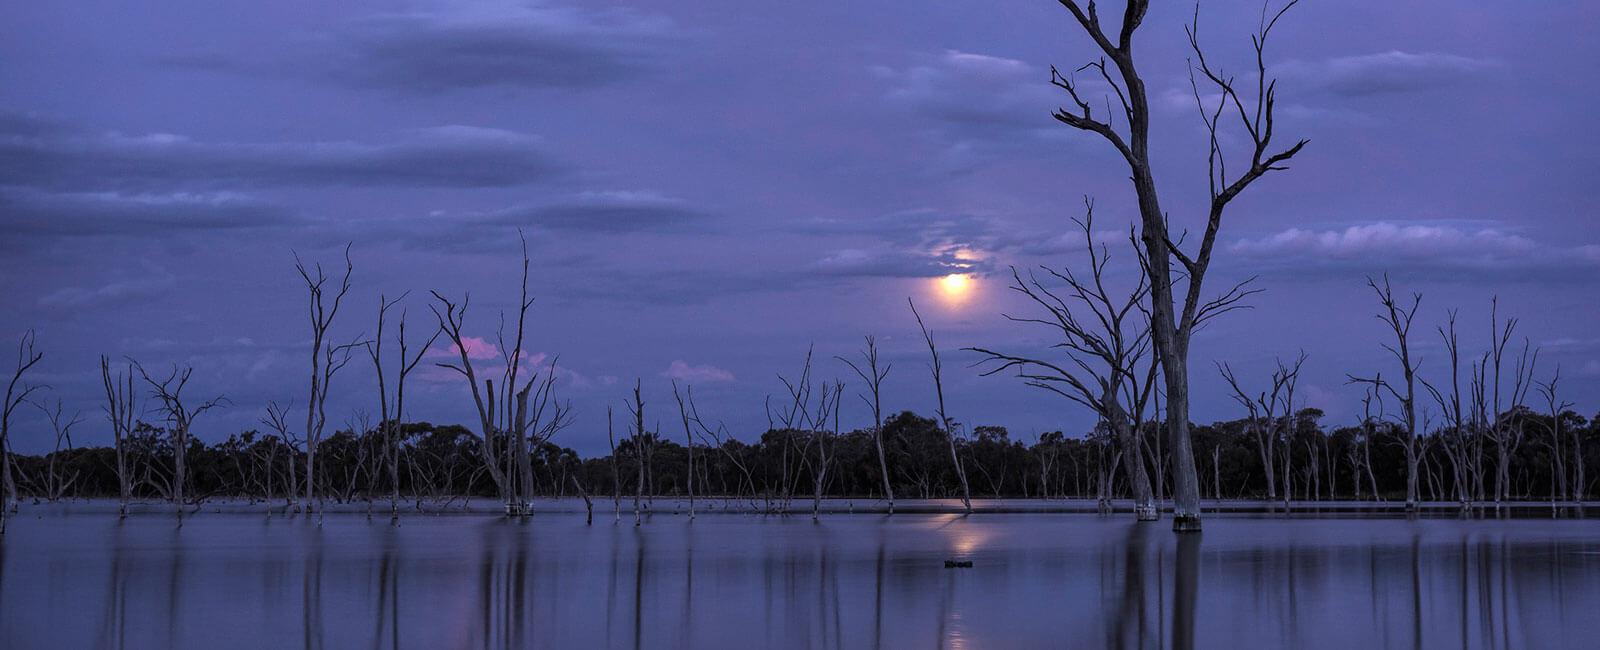 Boshack Lake